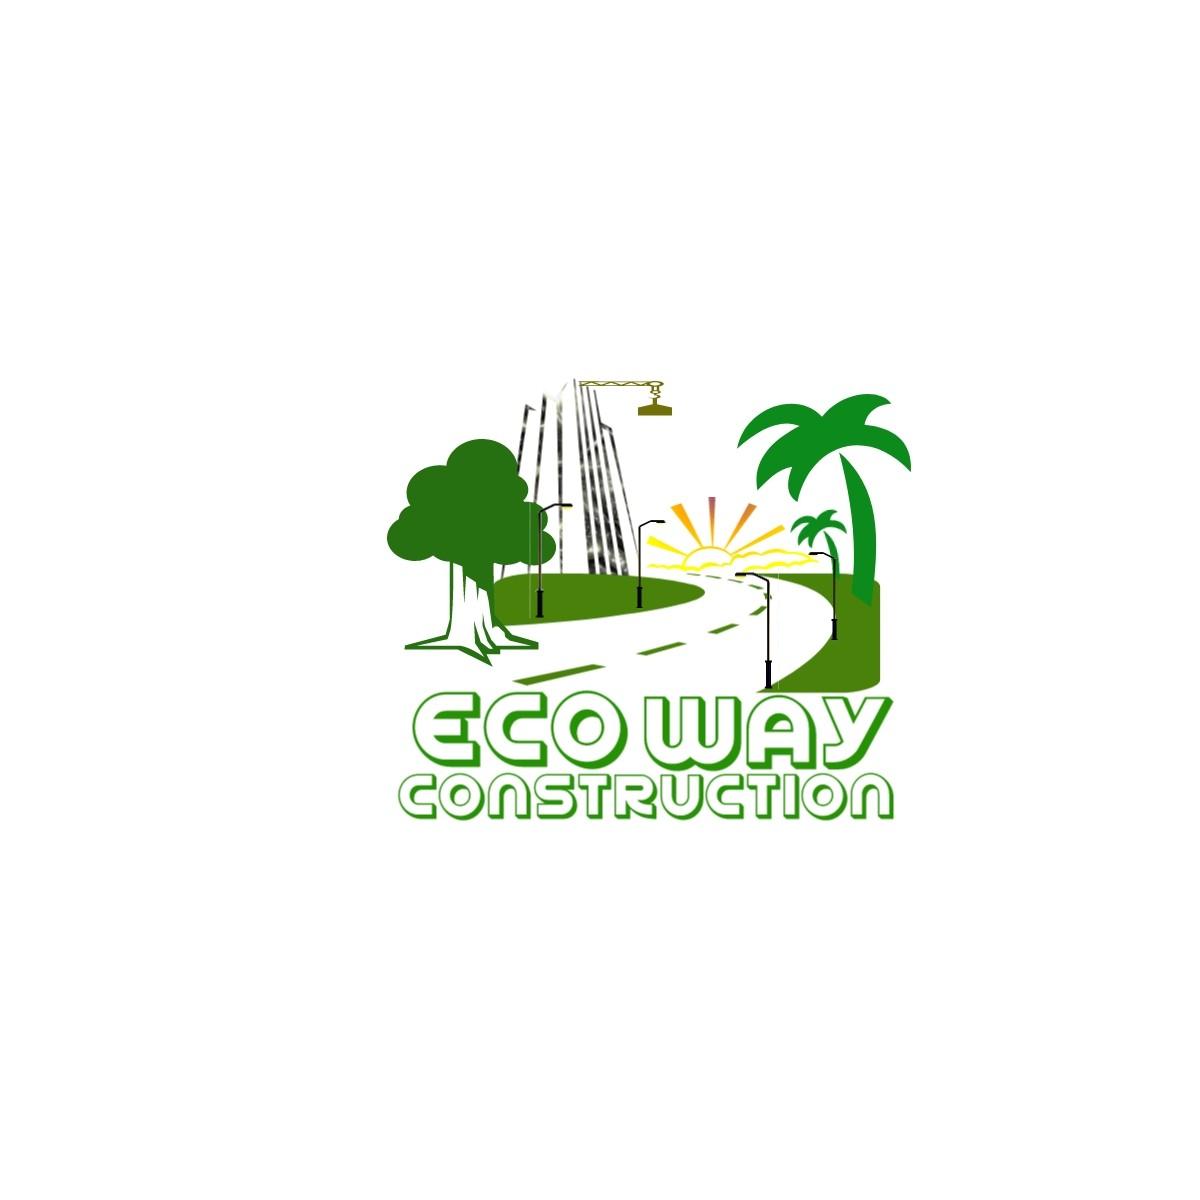 ECOWAY CONSTRUCTION